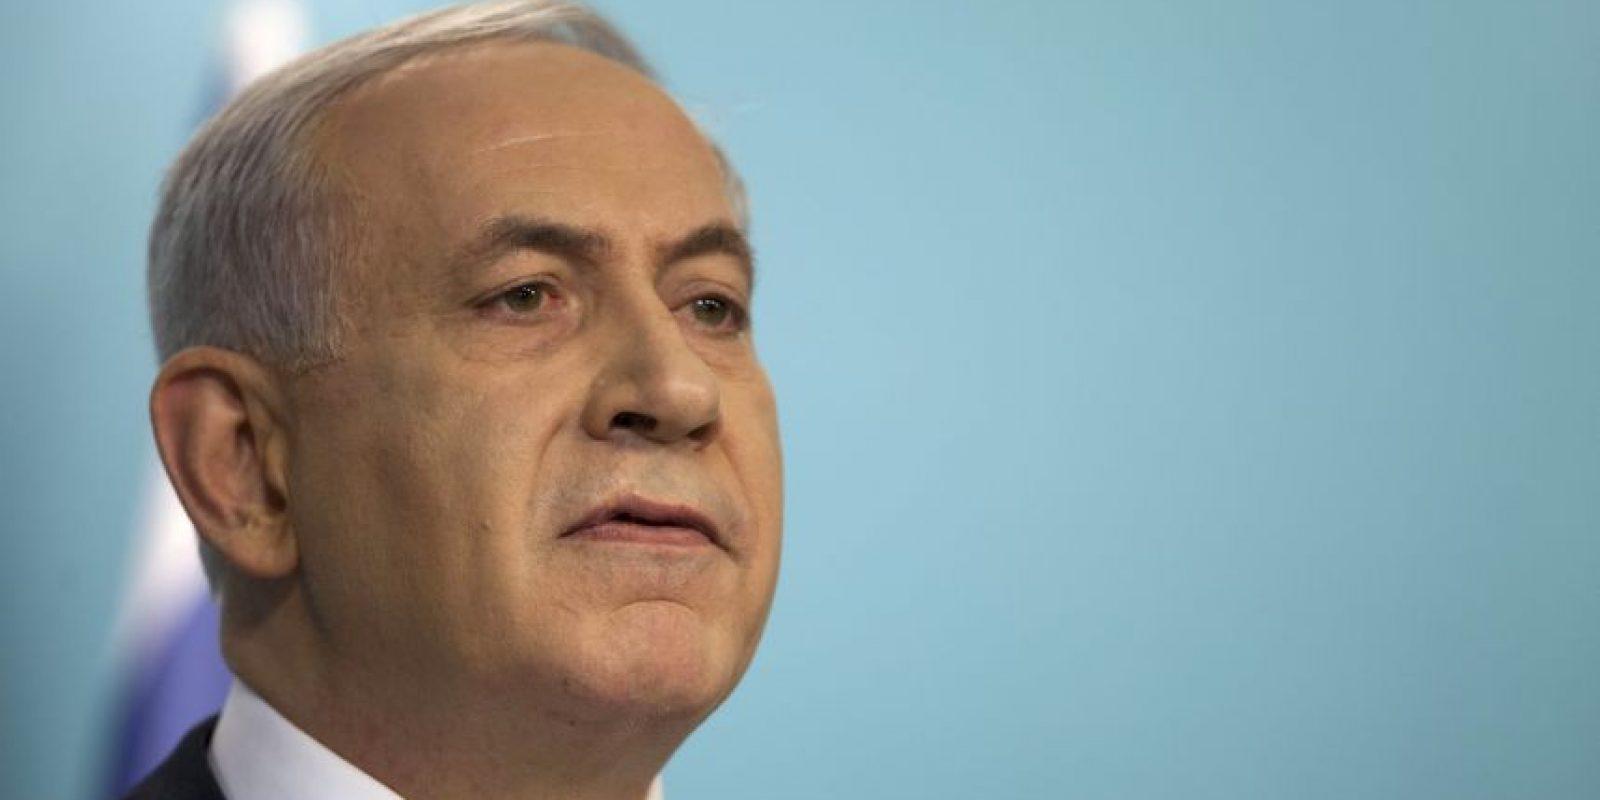 El Primer Ministro de Israel, Benjamin Netanyahu. Foto:Getty Images